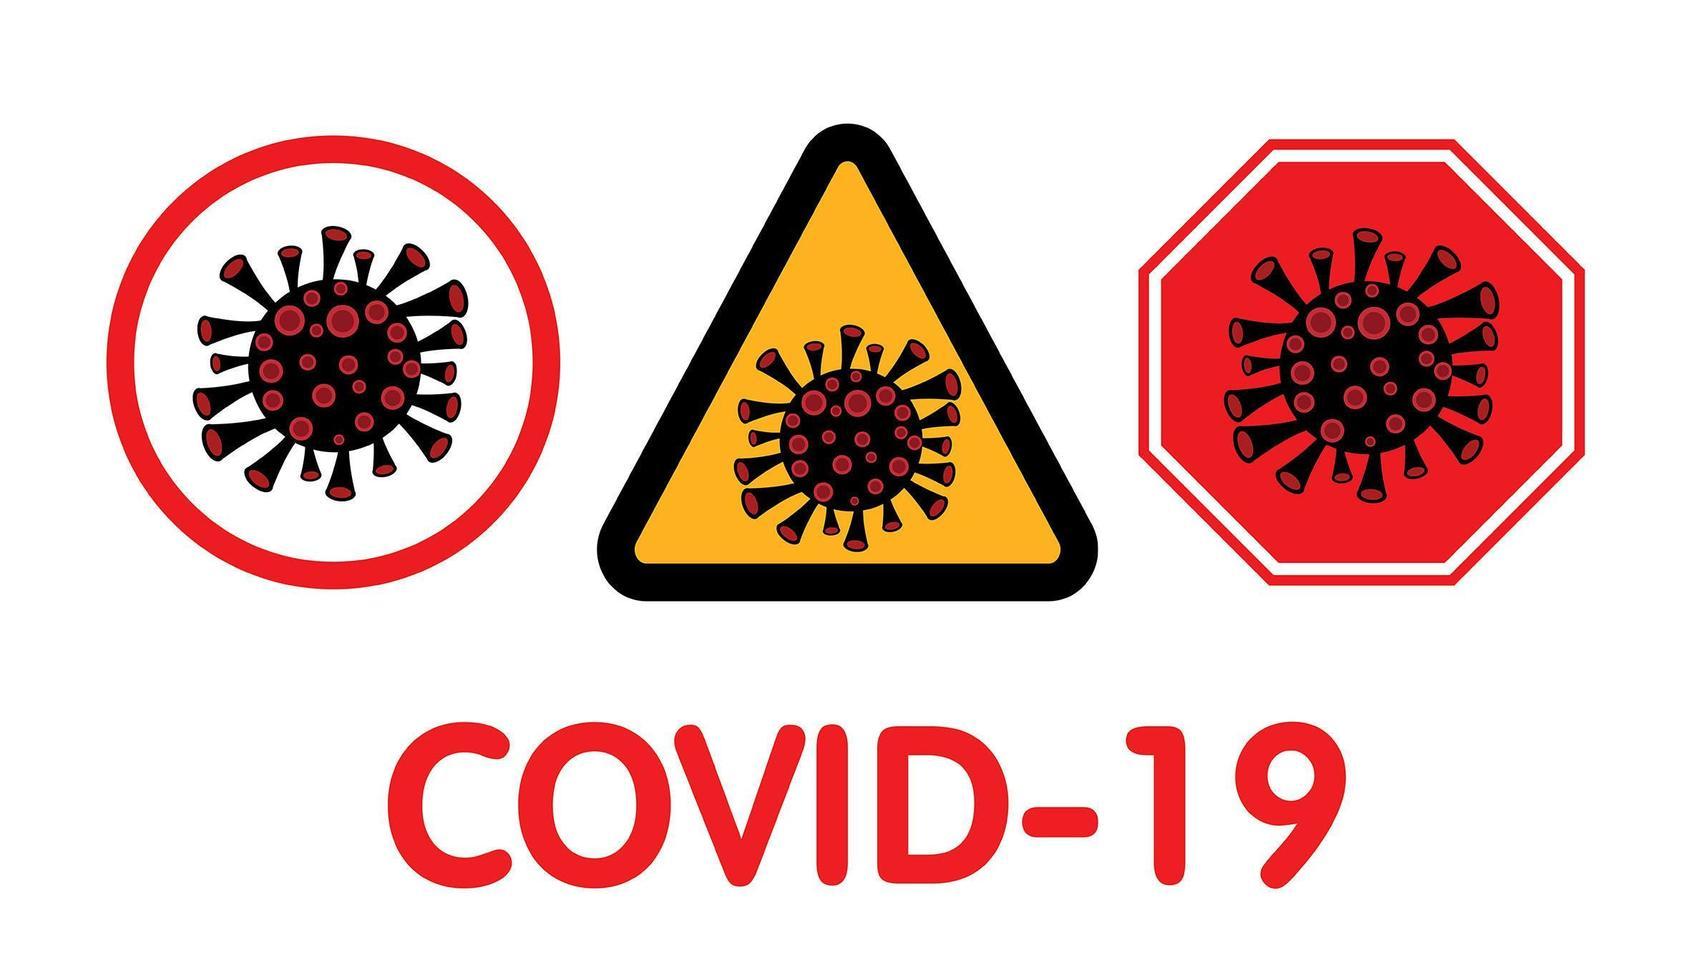 Covid-19, Coronavirus signs. vector